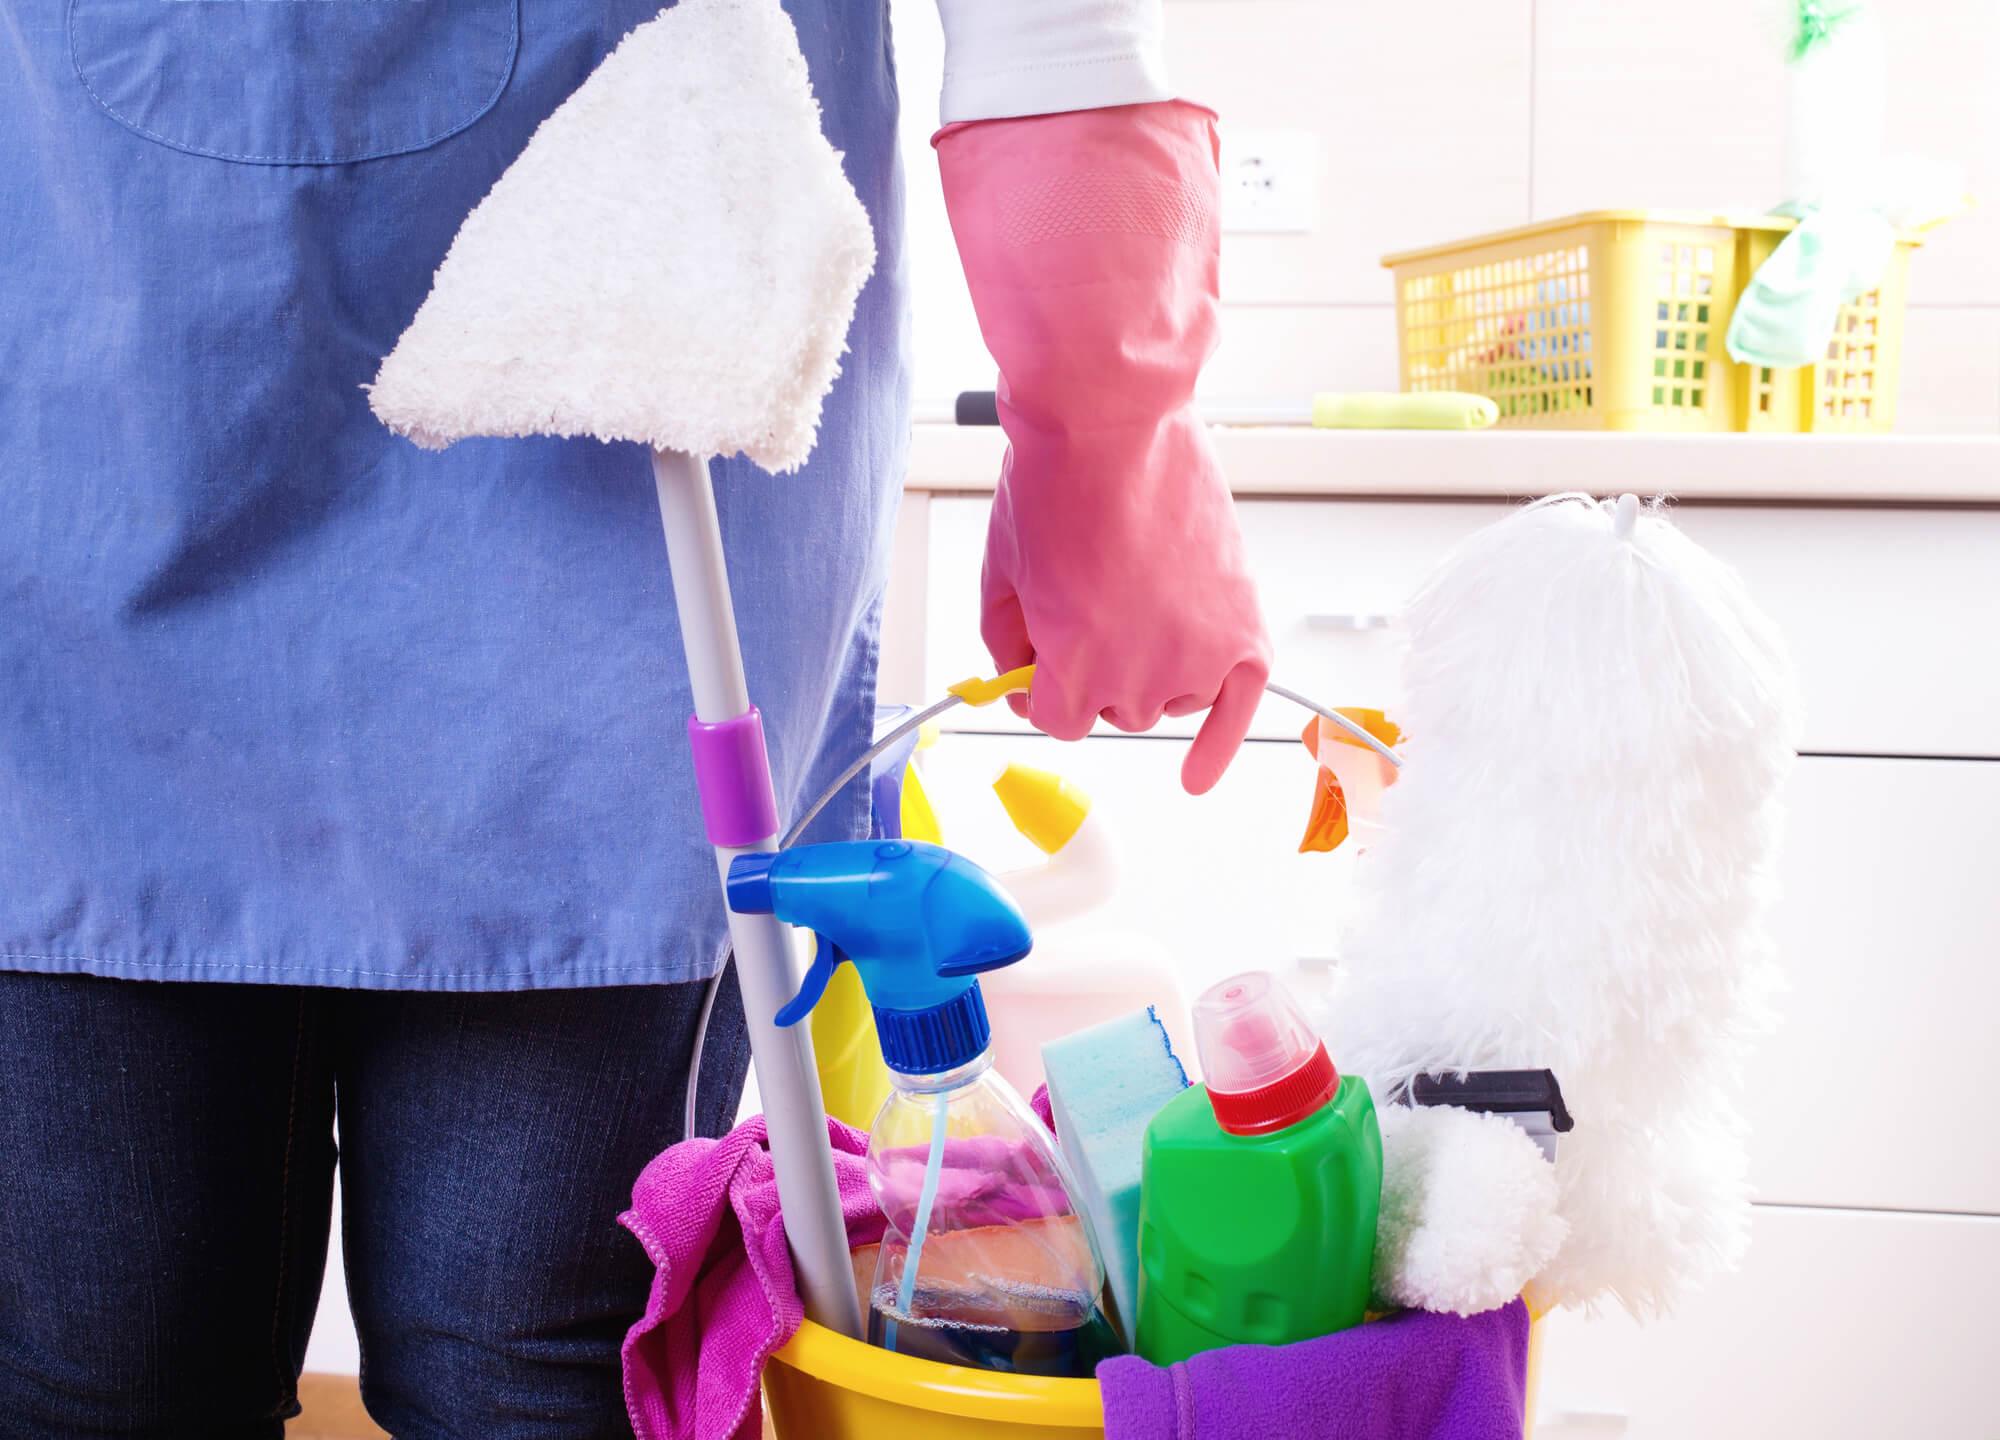 ef7bbdc966bf3 6 cuidados necessários com produtos químicos de limpeza   IPC Brasil